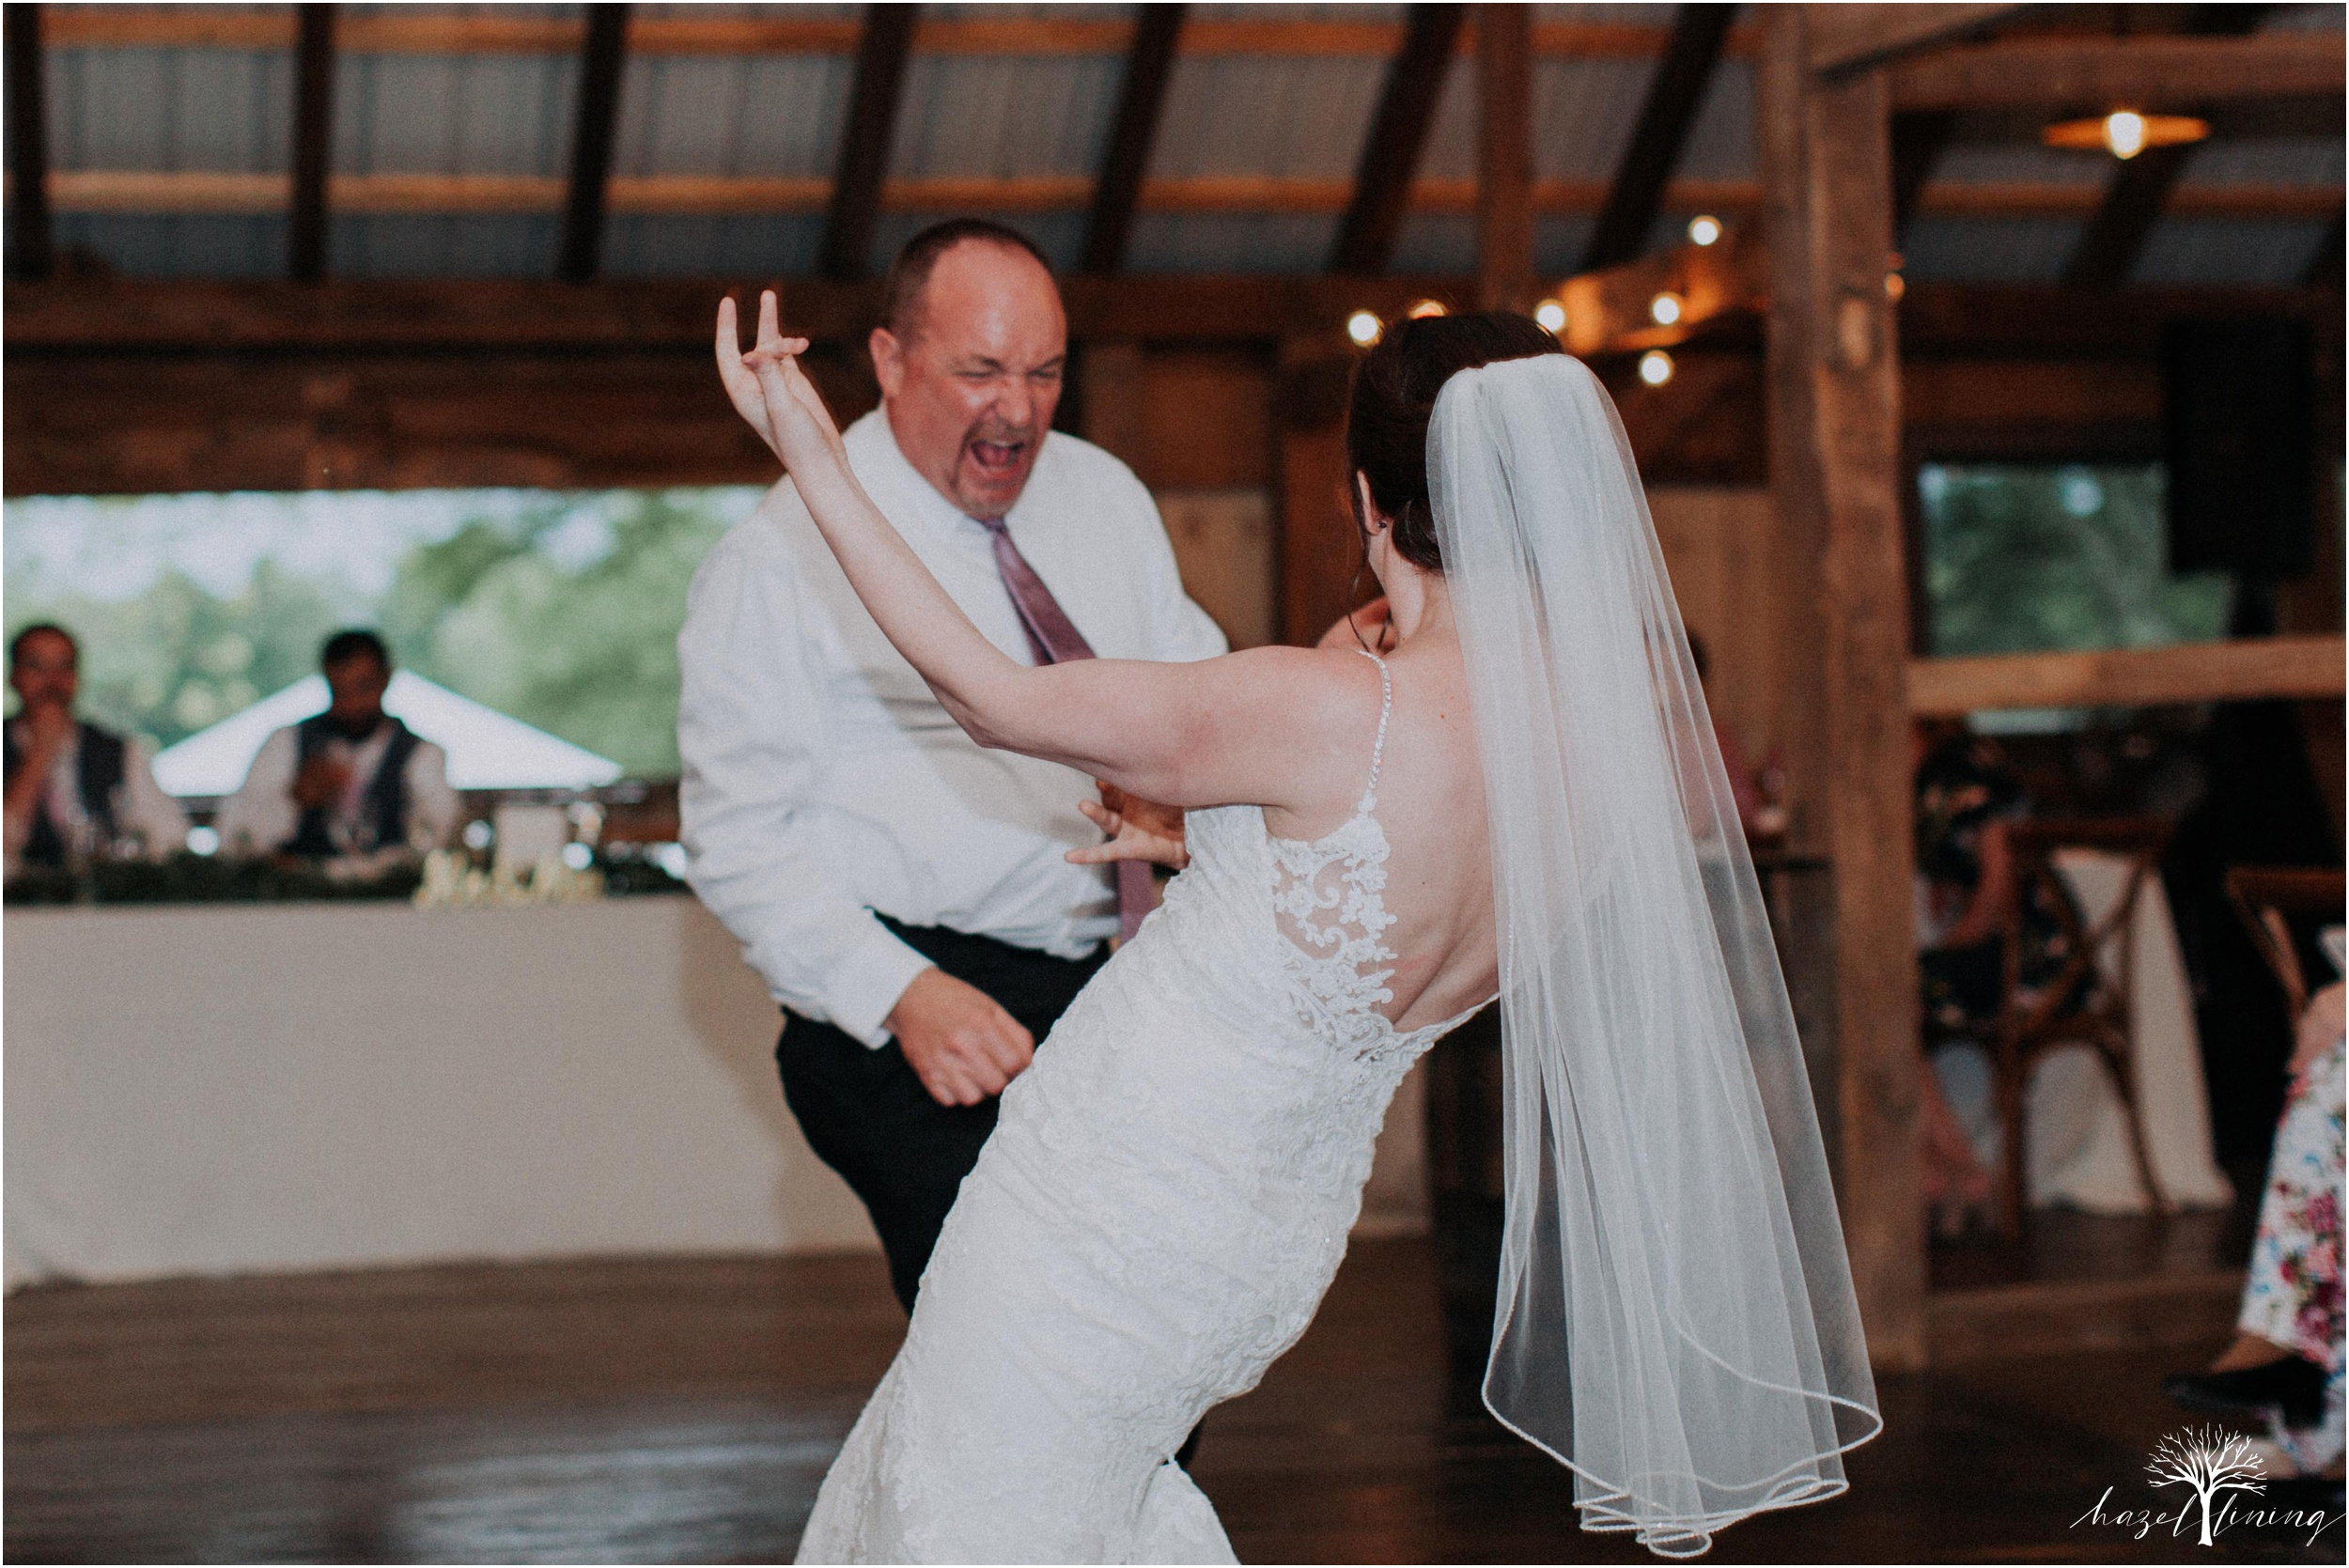 hazel-lining-travel-wedding-elopement-photography-lisa-landon-shoemaker-the-farm-bakery-and-events-bucks-county-quakertown-pennsylvania-summer-country-outdoor-farm-wedding_0131.jpg